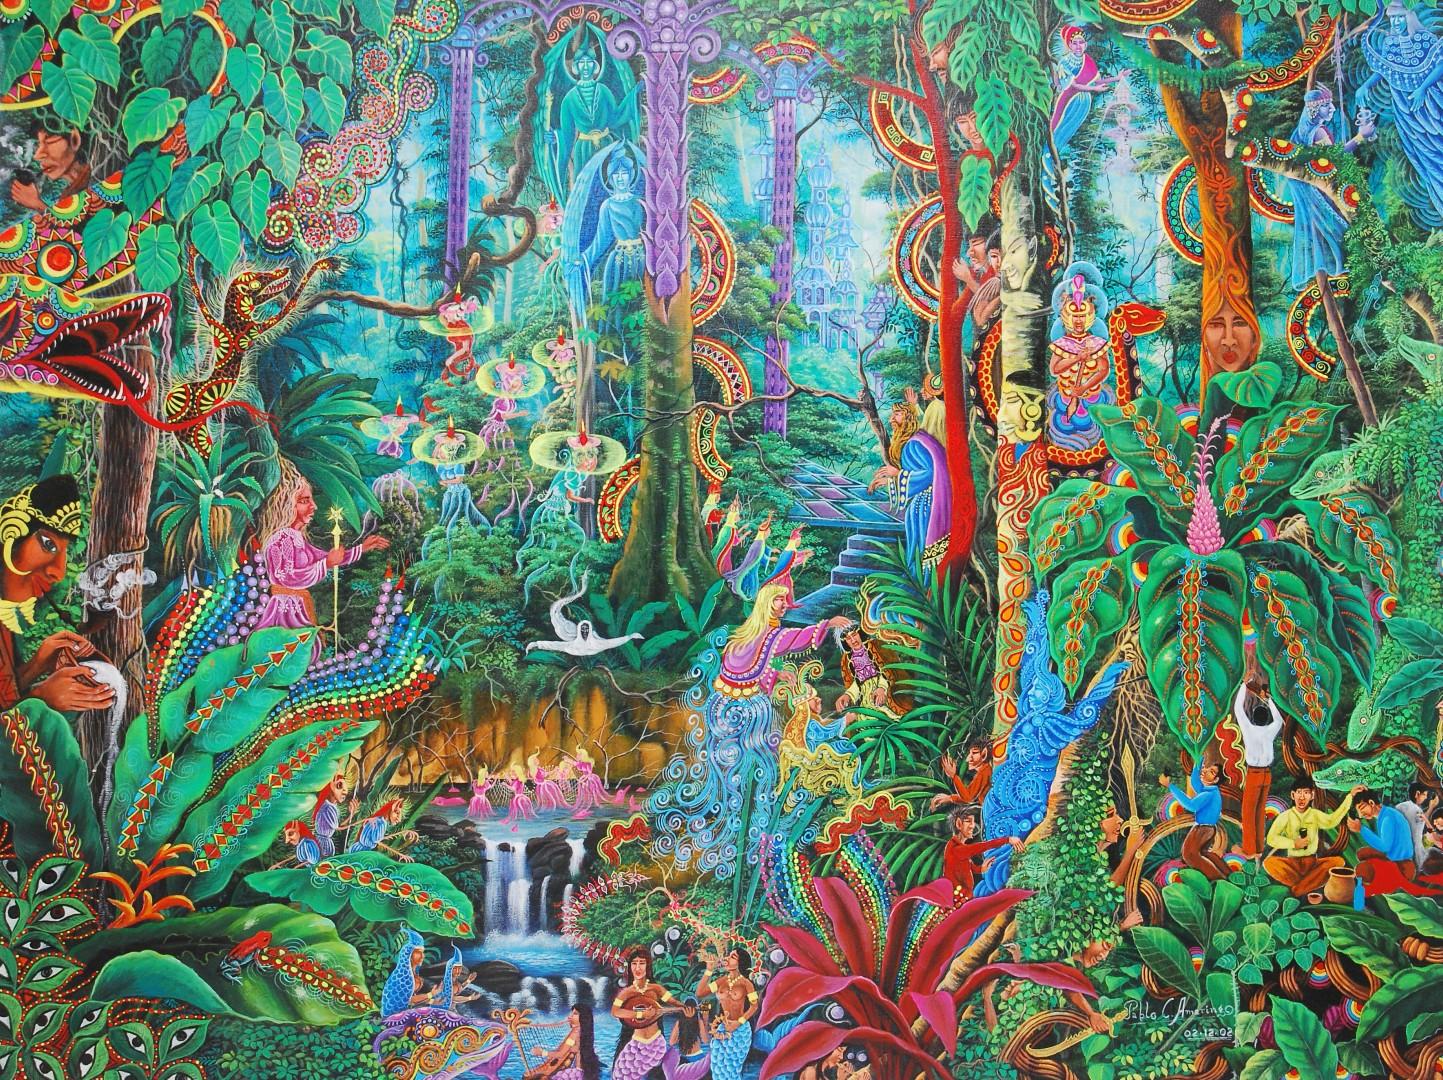 Visionary Artwork by Pablo Amaringo